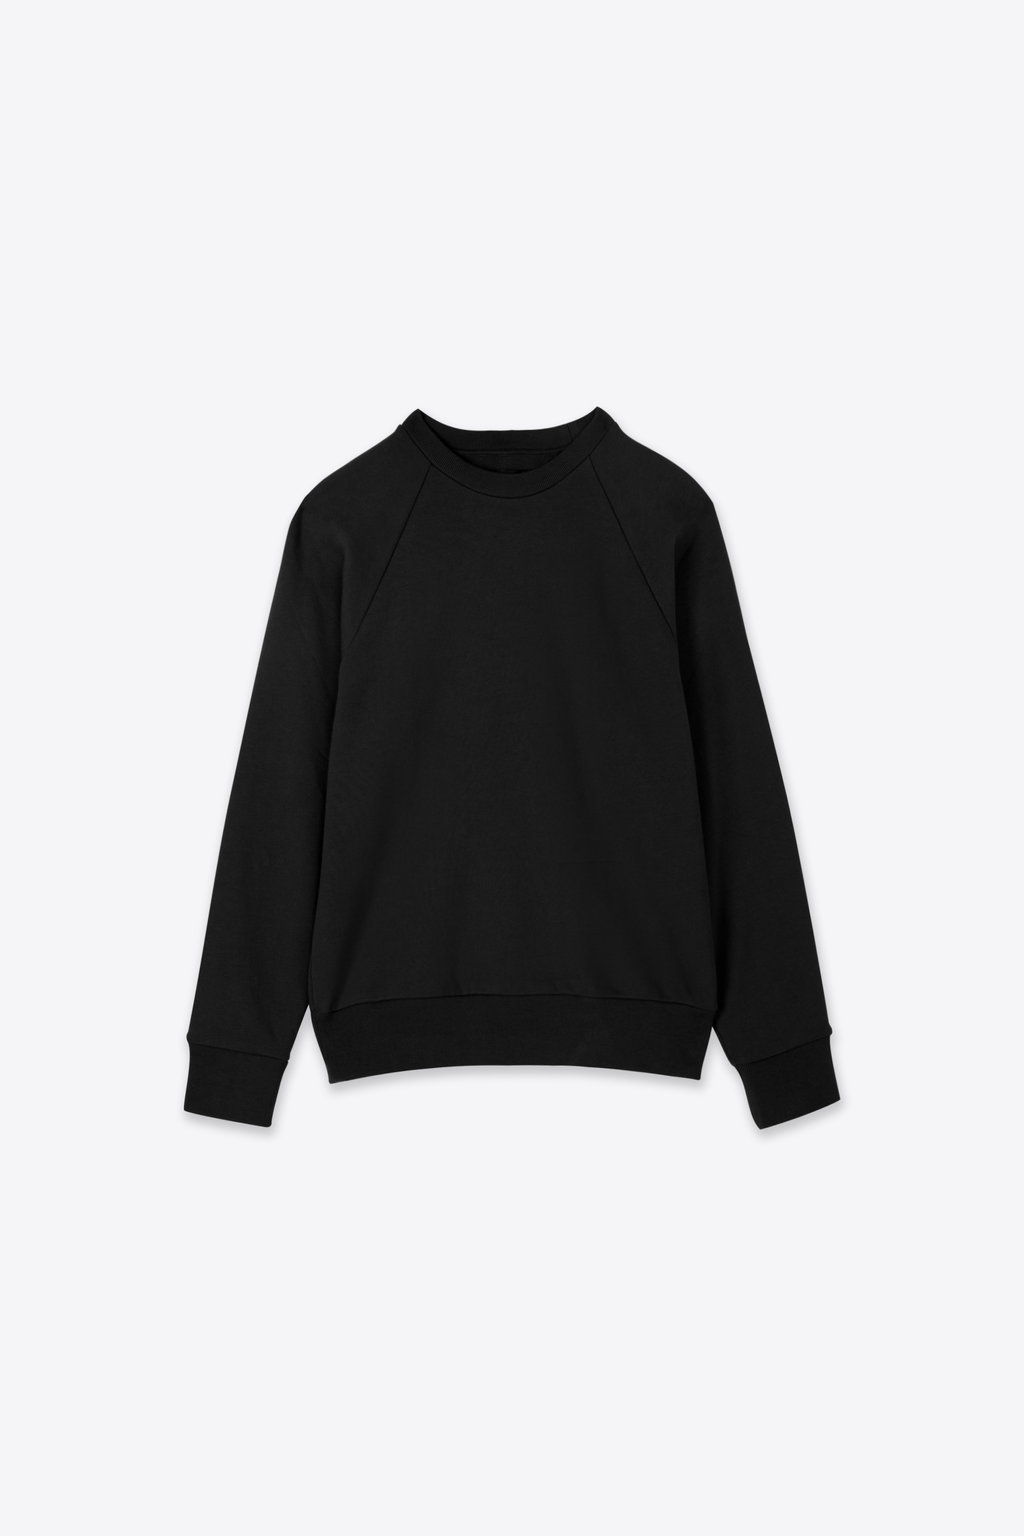 Sweatshirt 2474 Black 5